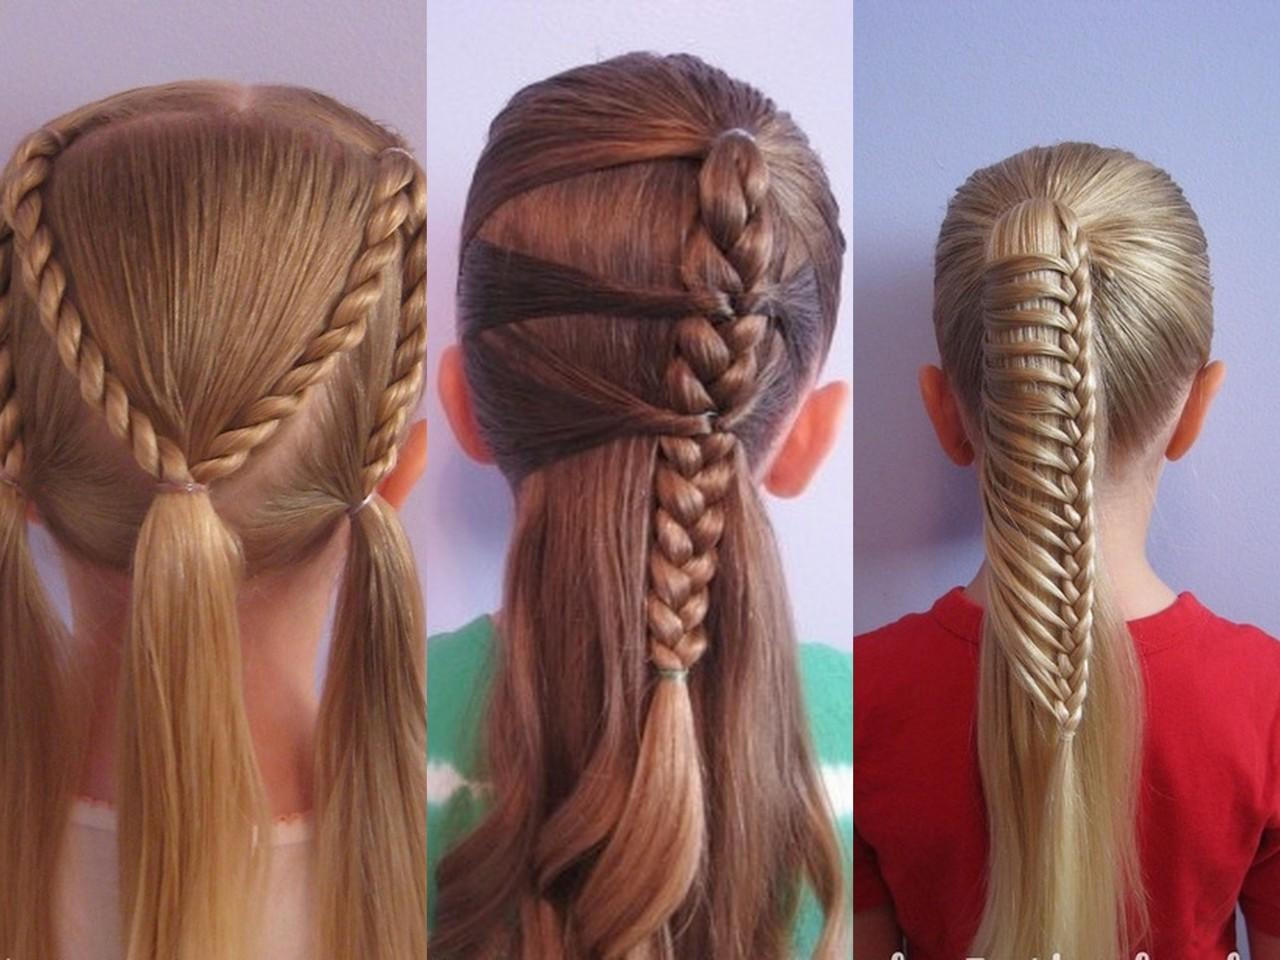 Косички своими руками для коротких волос фото 175